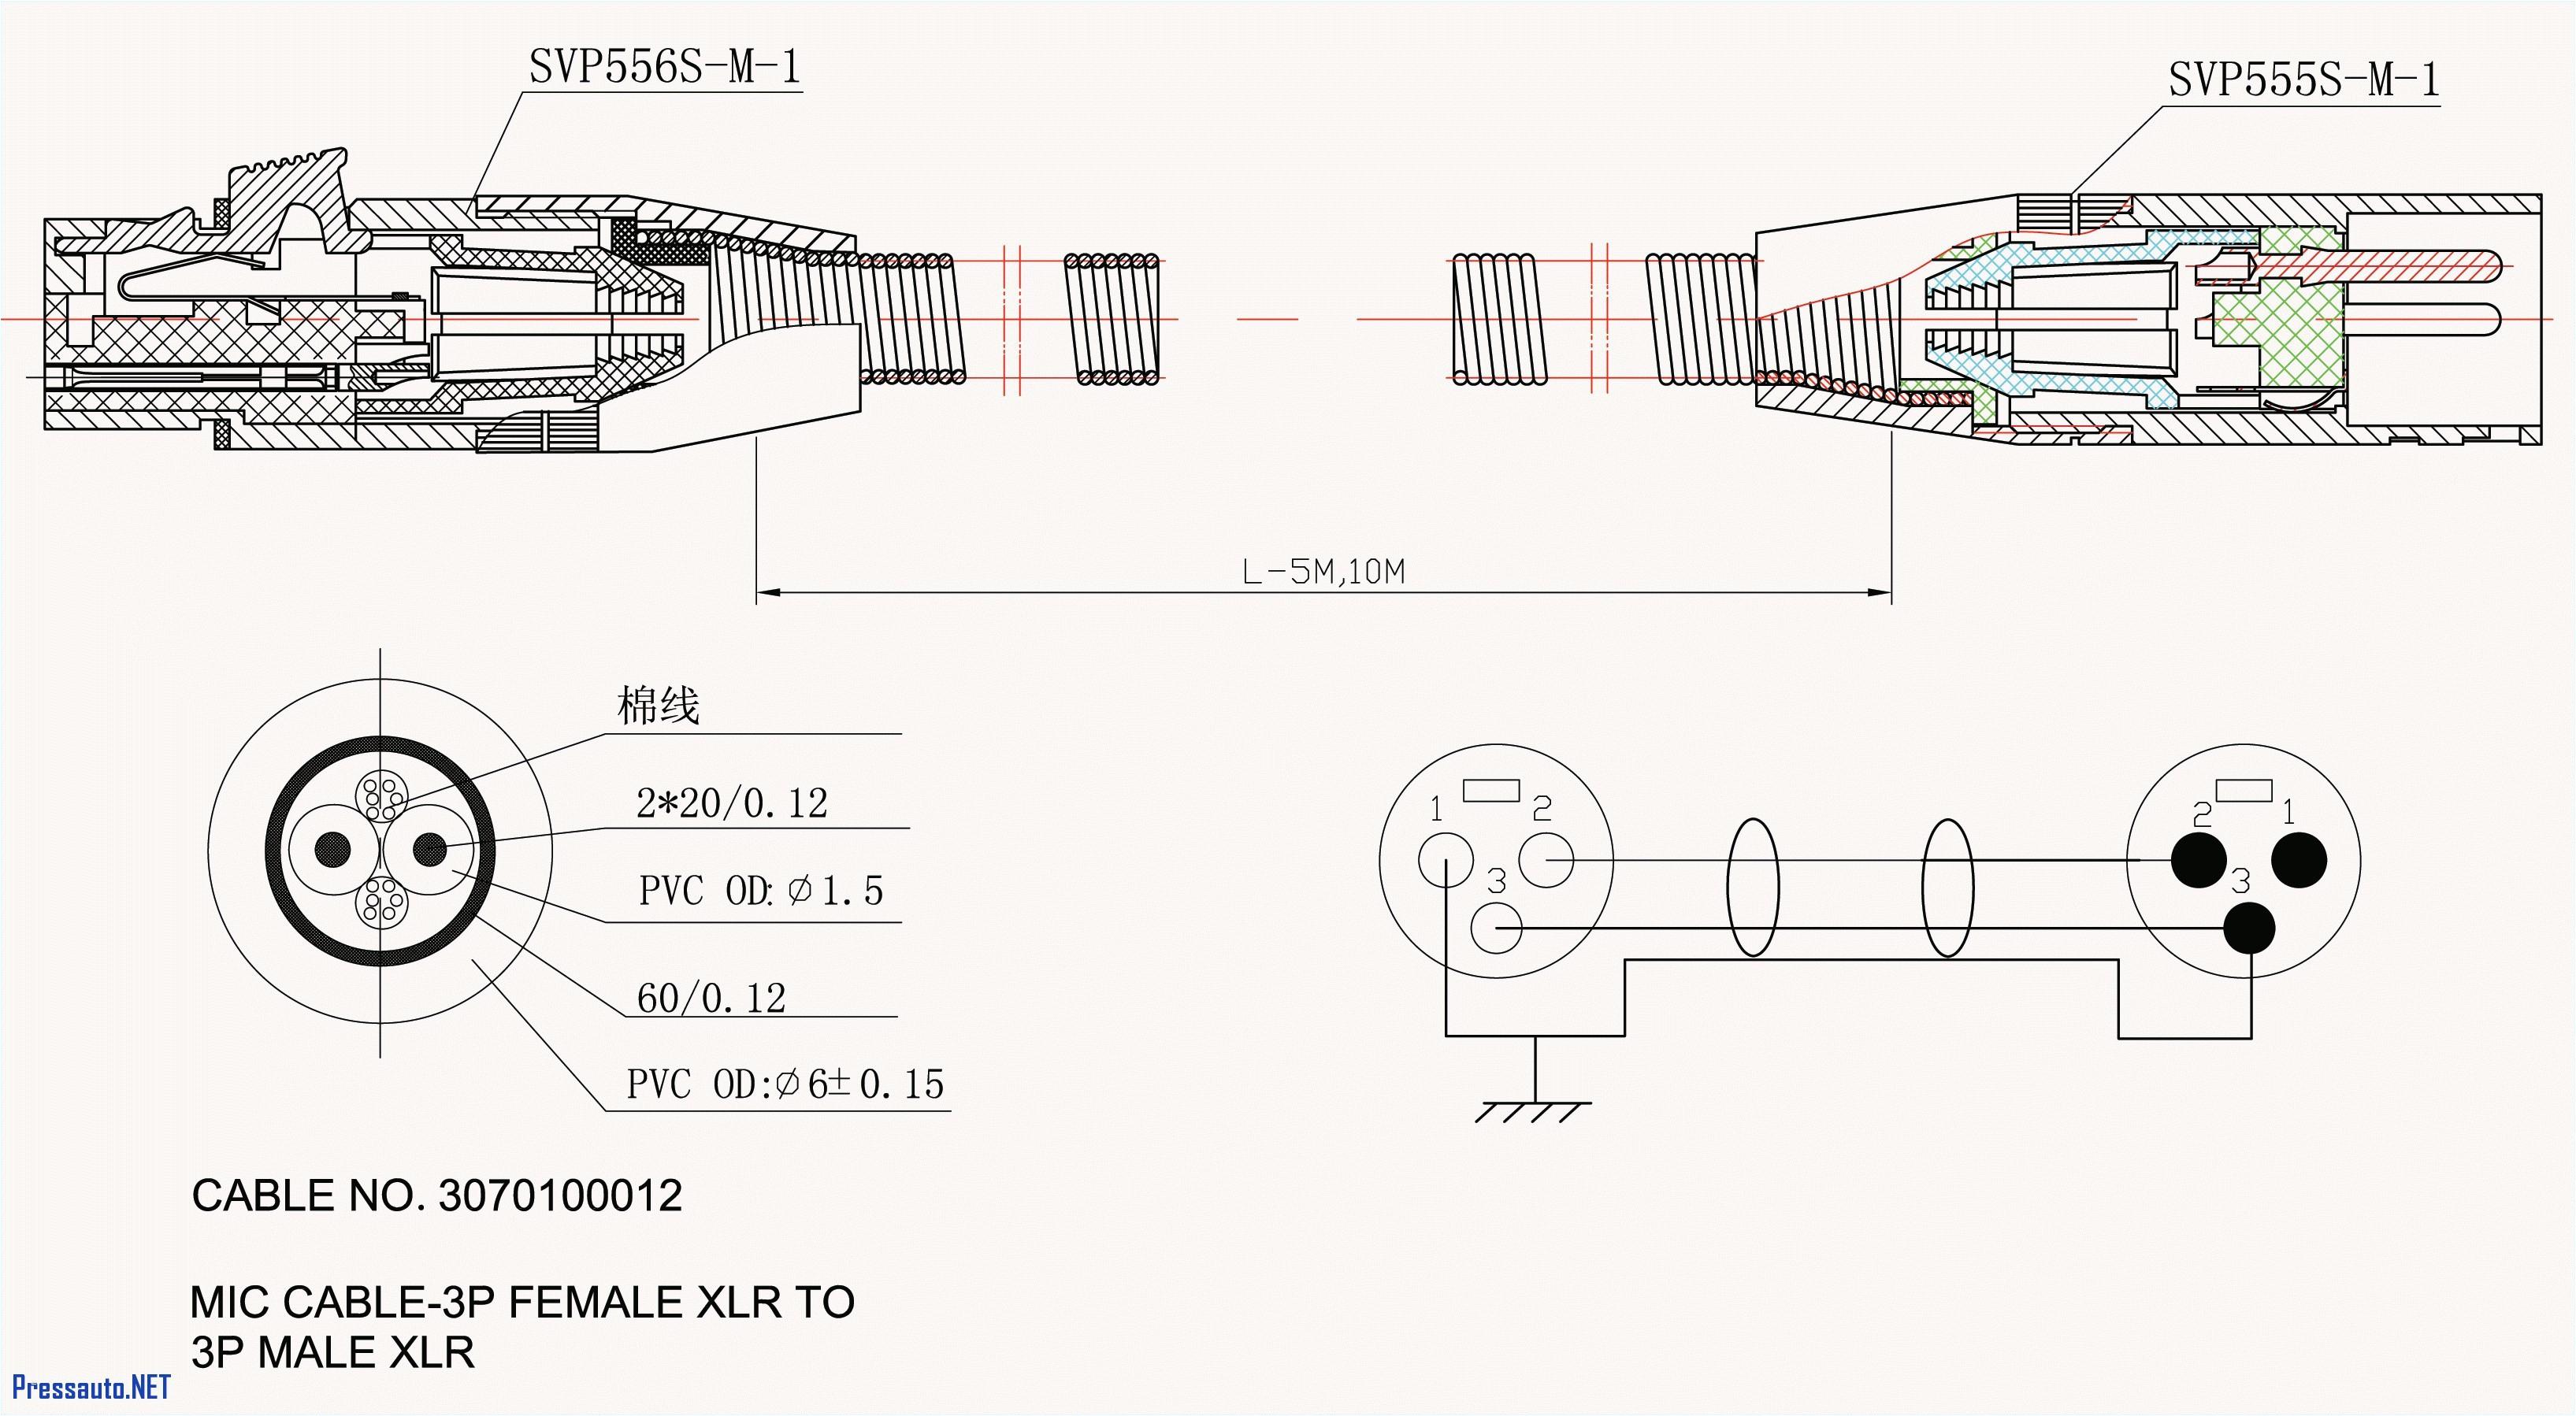 Stx38 Wiring Diagram Phantom Wiring Diagram Wiring Diagram Technic